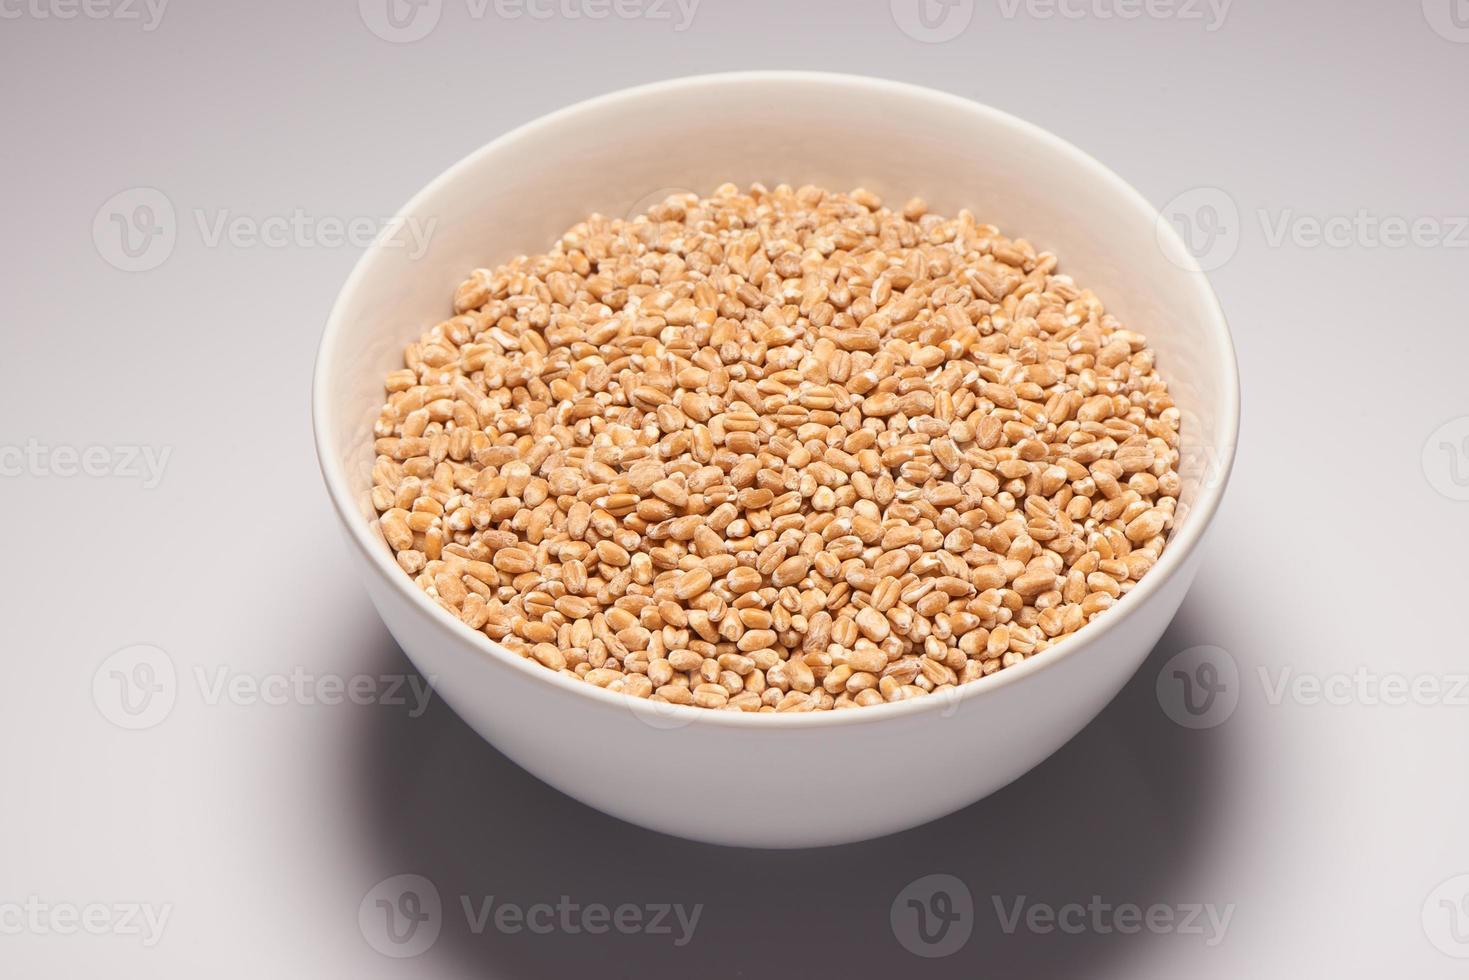 Barley in white ceramic bowl on white background photo